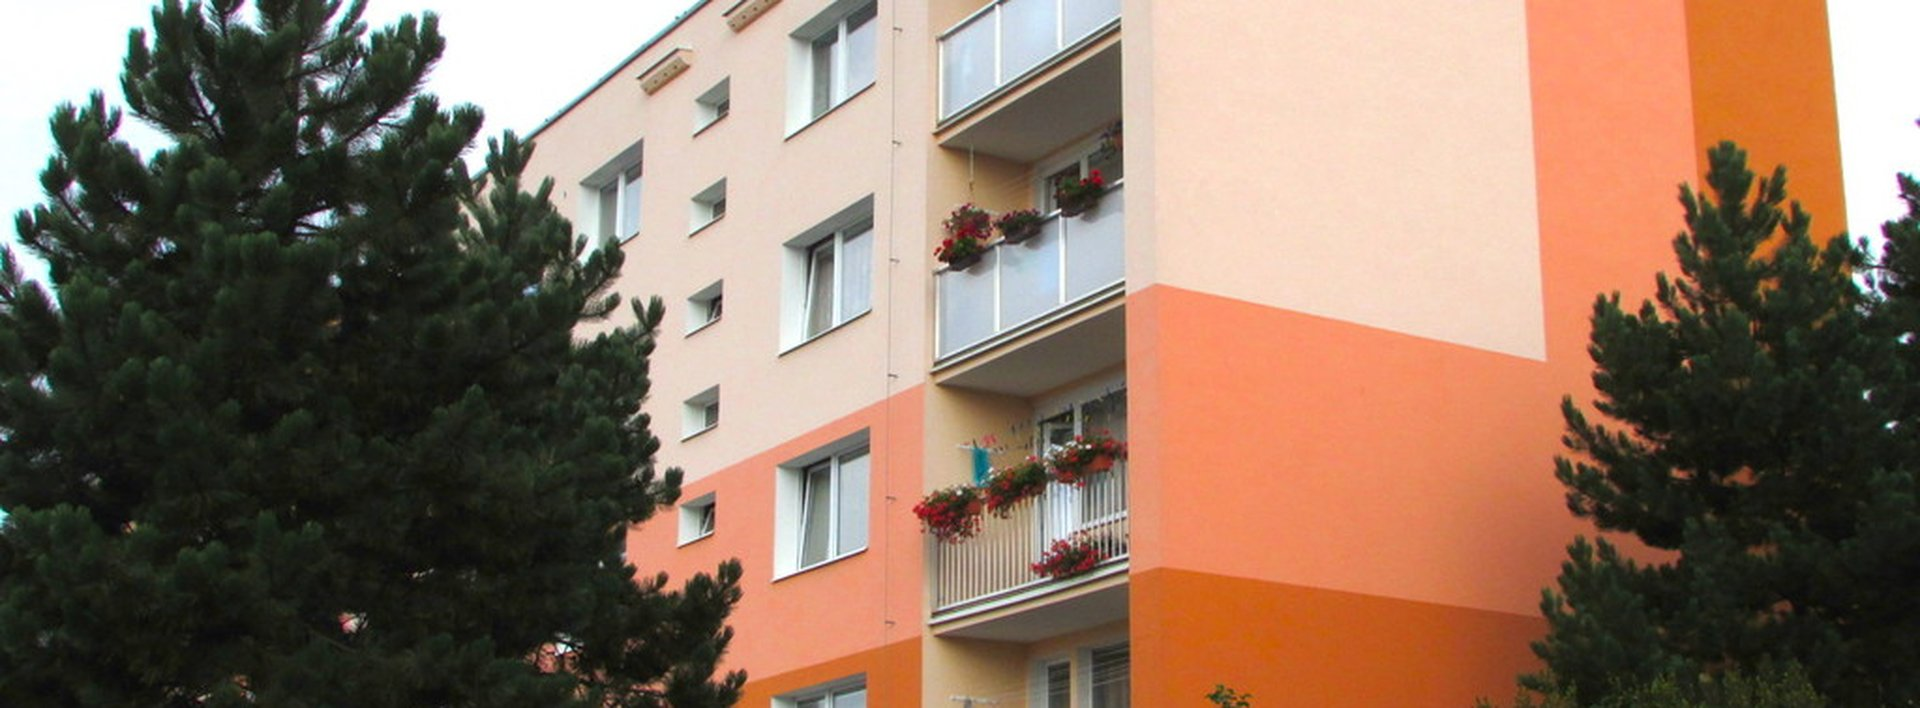 Prodej byt 2+kk, 44 m² - Liberec, Starý Harcov, Ev.č.: N47398